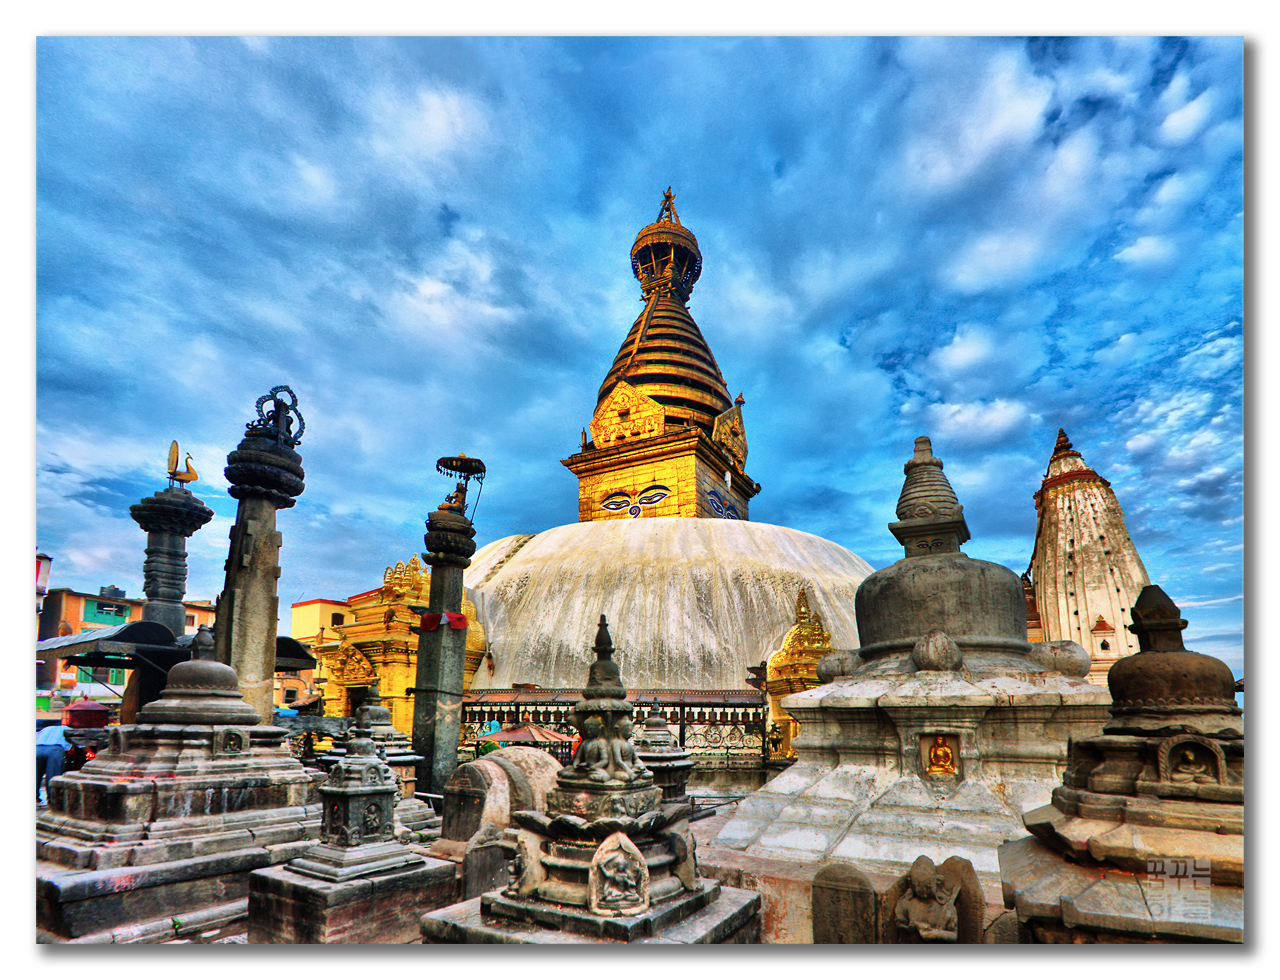 High Dynamic Peace - Swayambhunath (स्वयम्भूनाथ स्तुप), Nepal